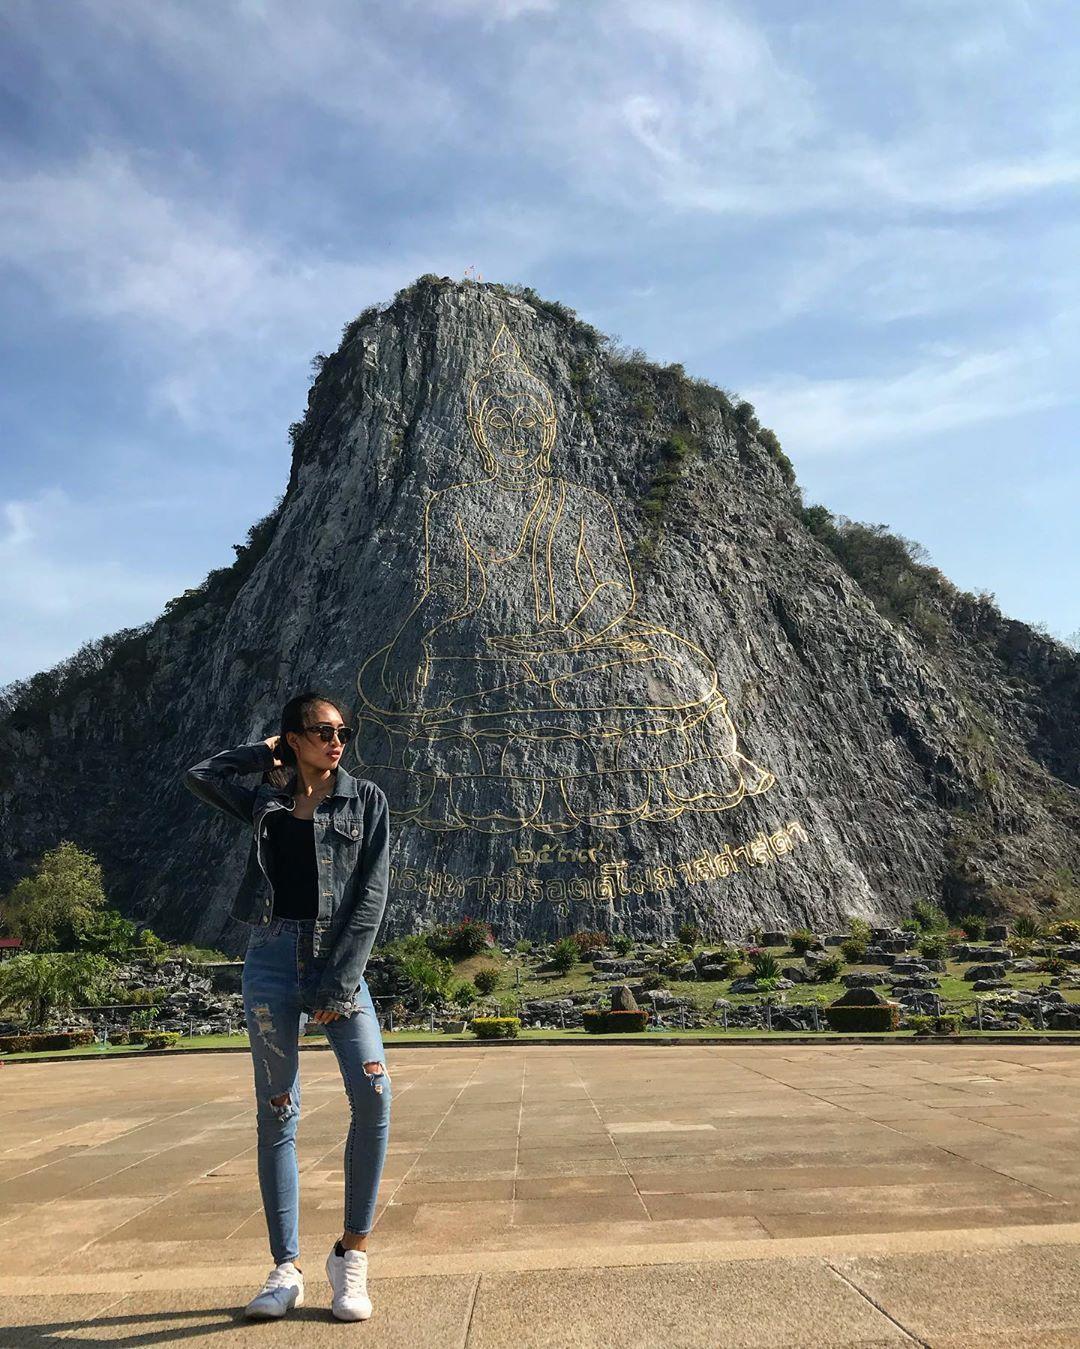 thailan_kinh-nghiem-du-lich-pattaya-05